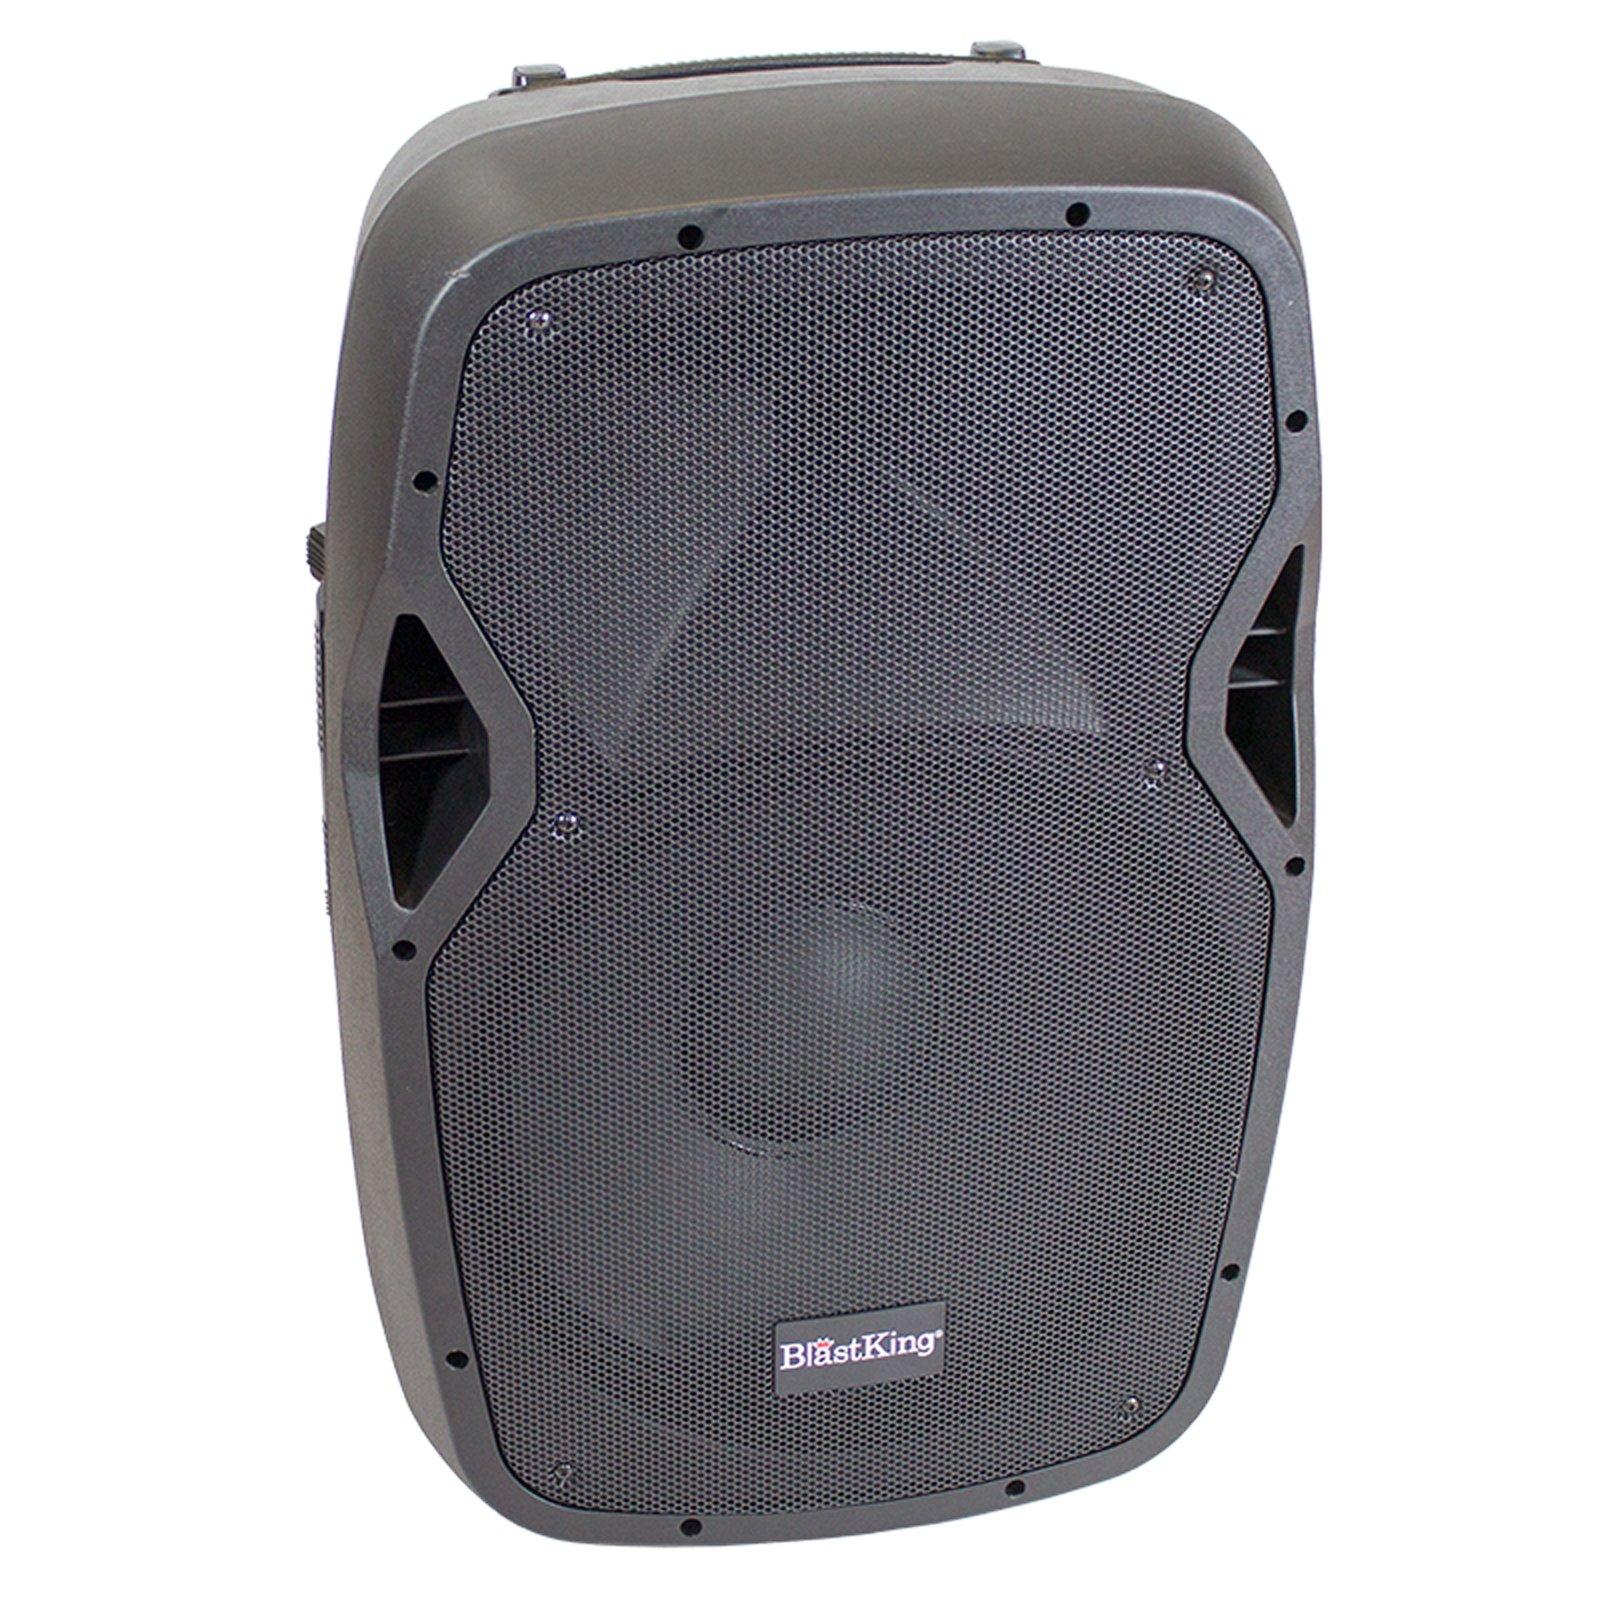 Blastking 15'' Active 1000W Watts Powered Speaker Bluetooth USB/MP3 Media Player BDS15ABT